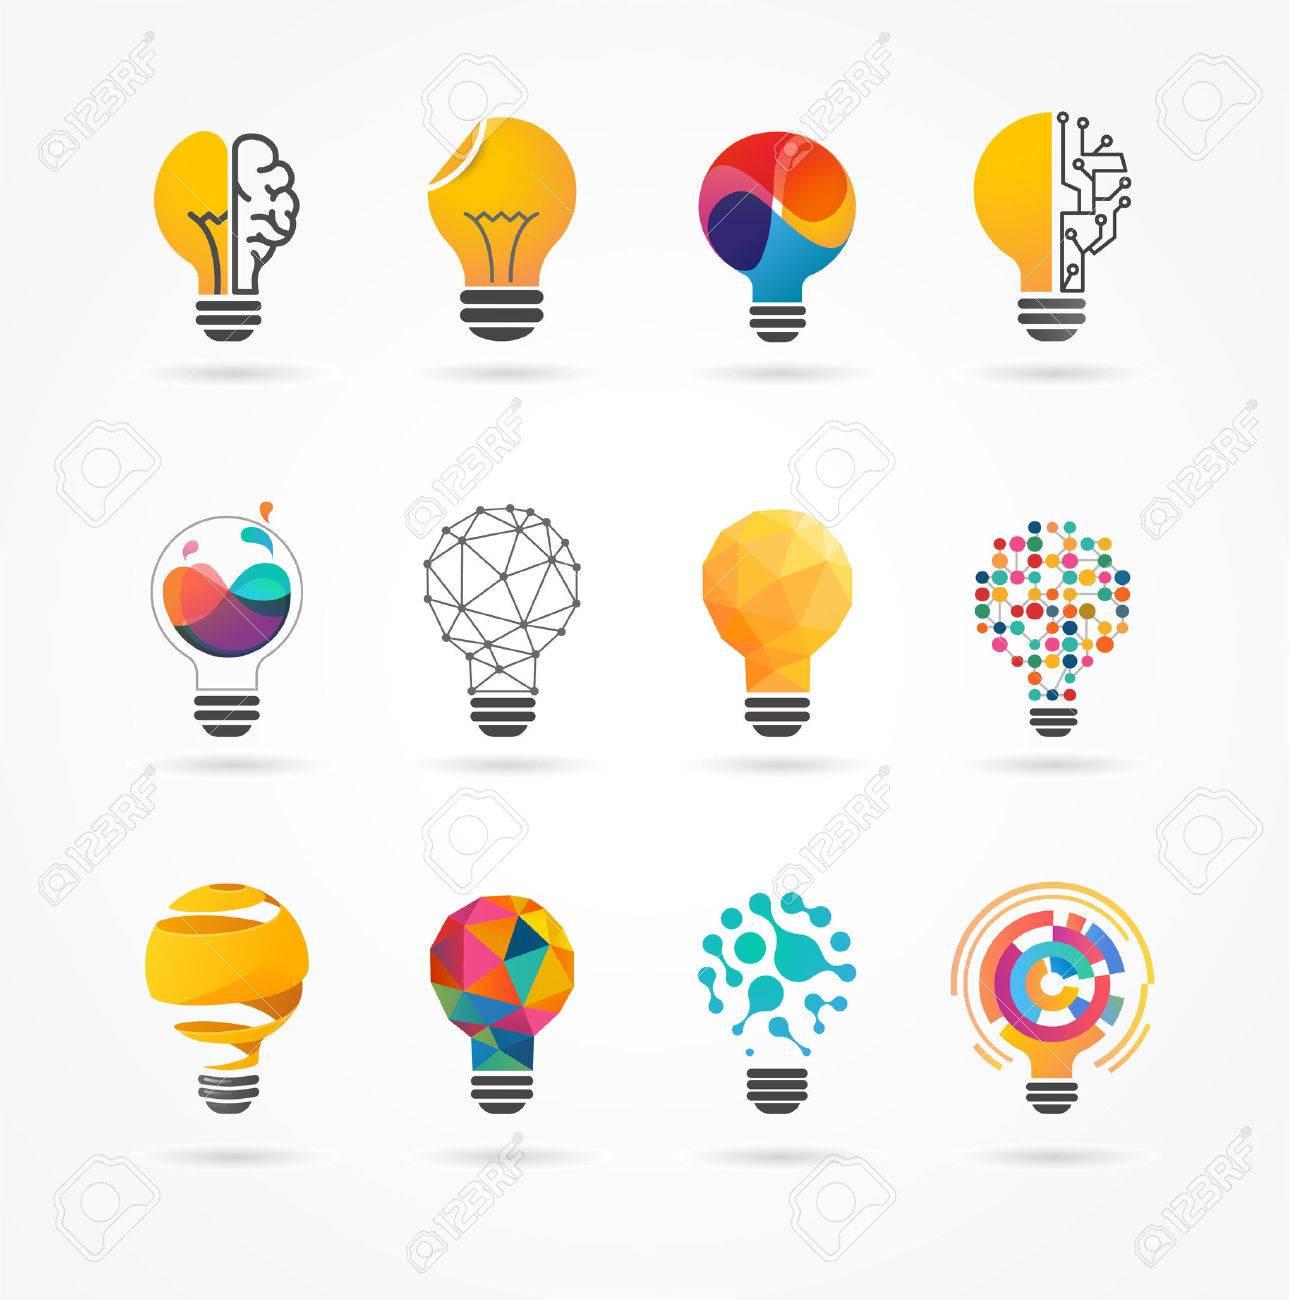 Light bulb - idea, creative, technology icons and elements - 52823563